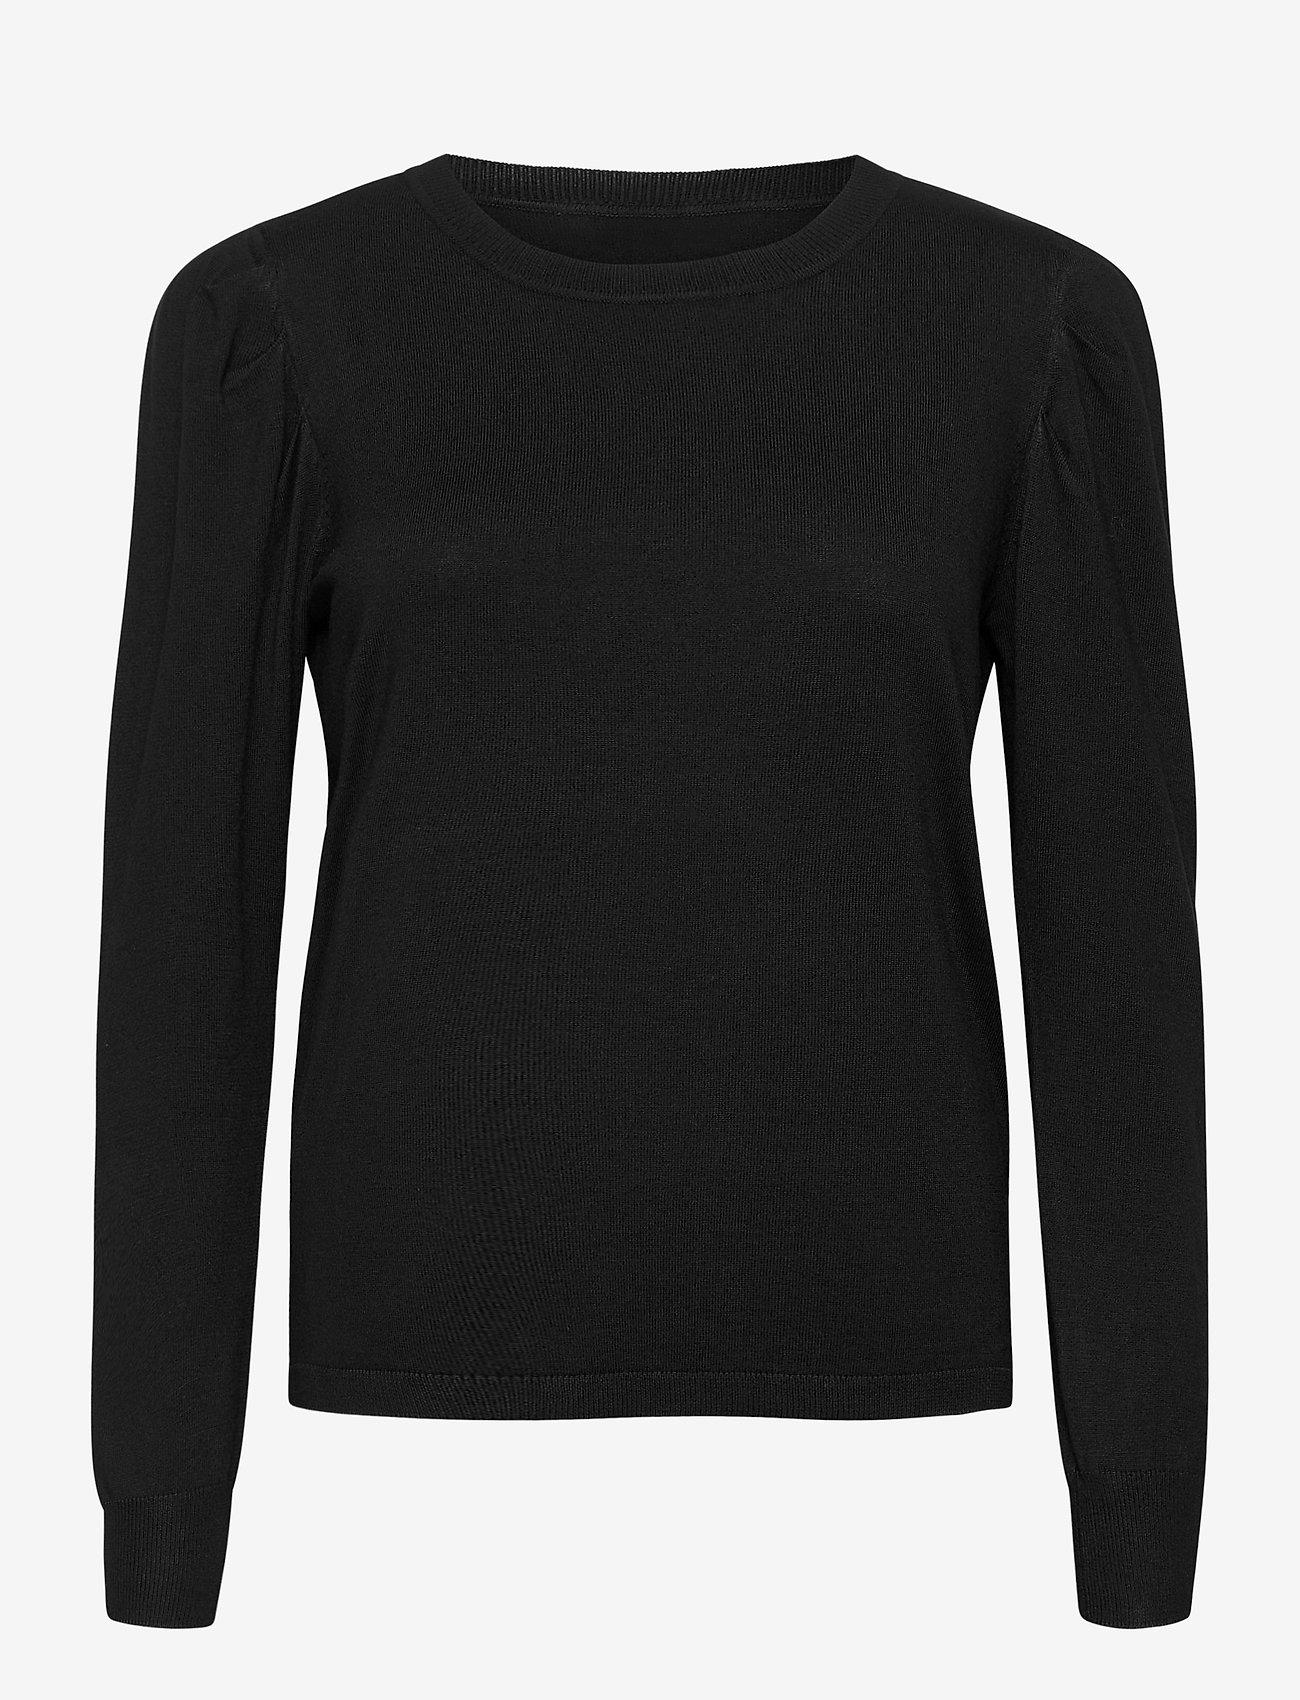 Fransa - ZUBASIC 130 Pullover - jumpers - black - 0